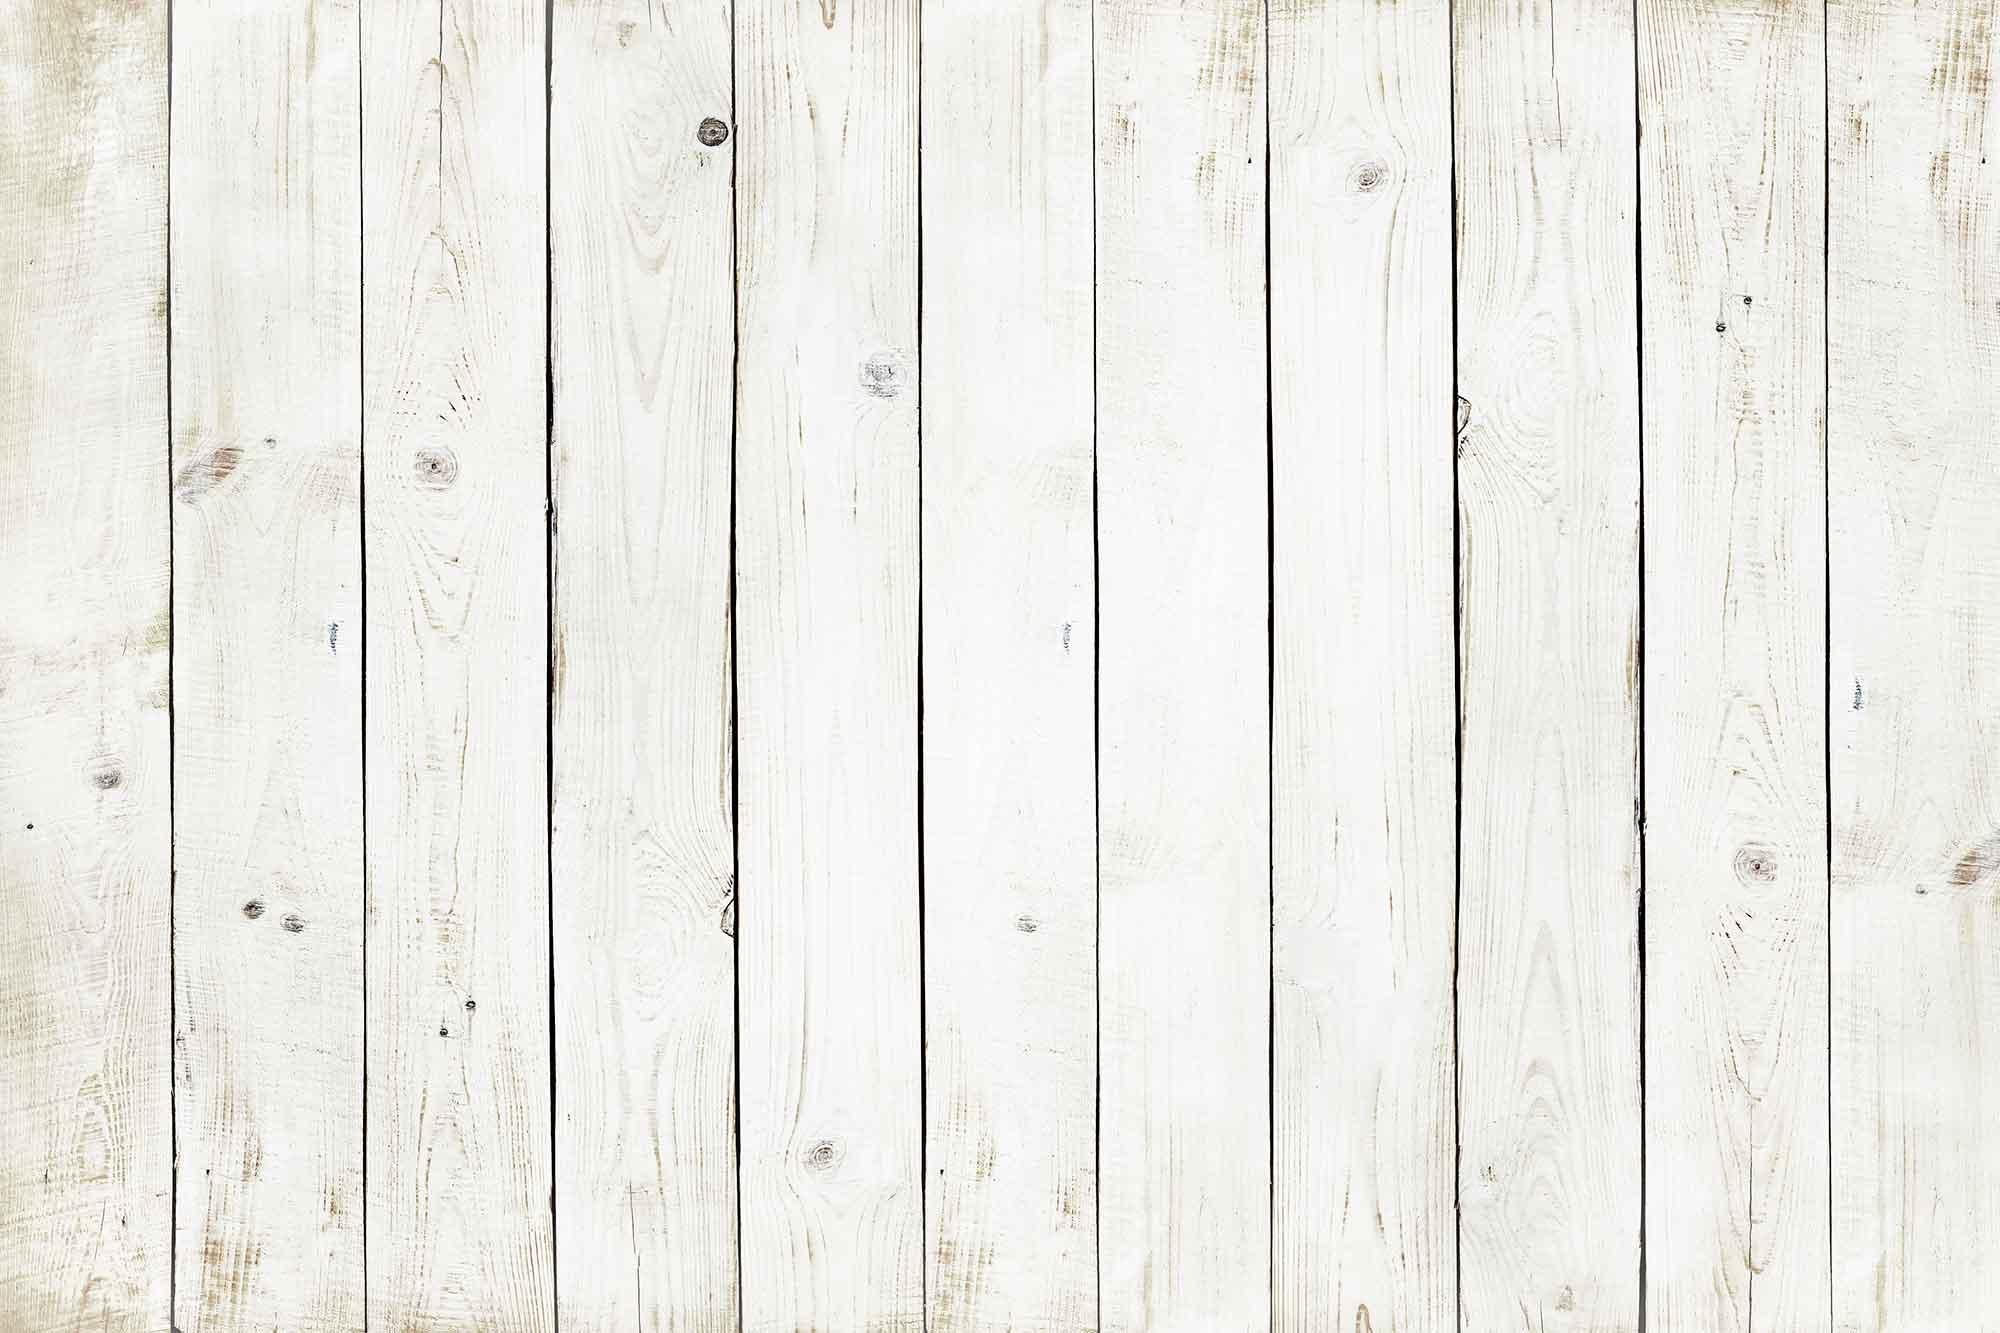 Light Wood Background Texture 4